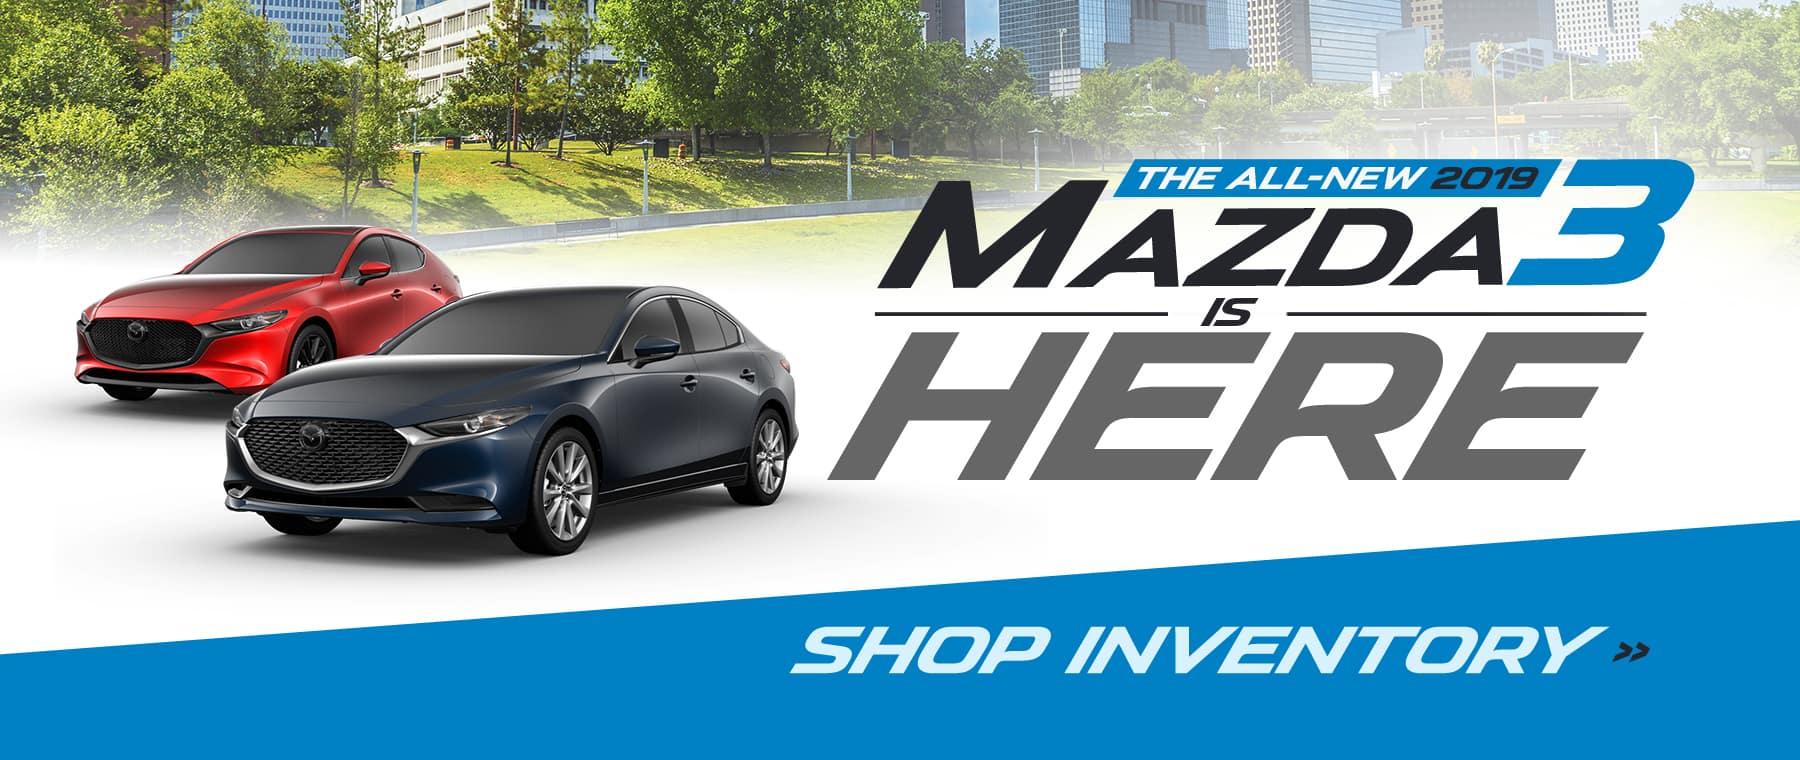 Shop Mazda 3